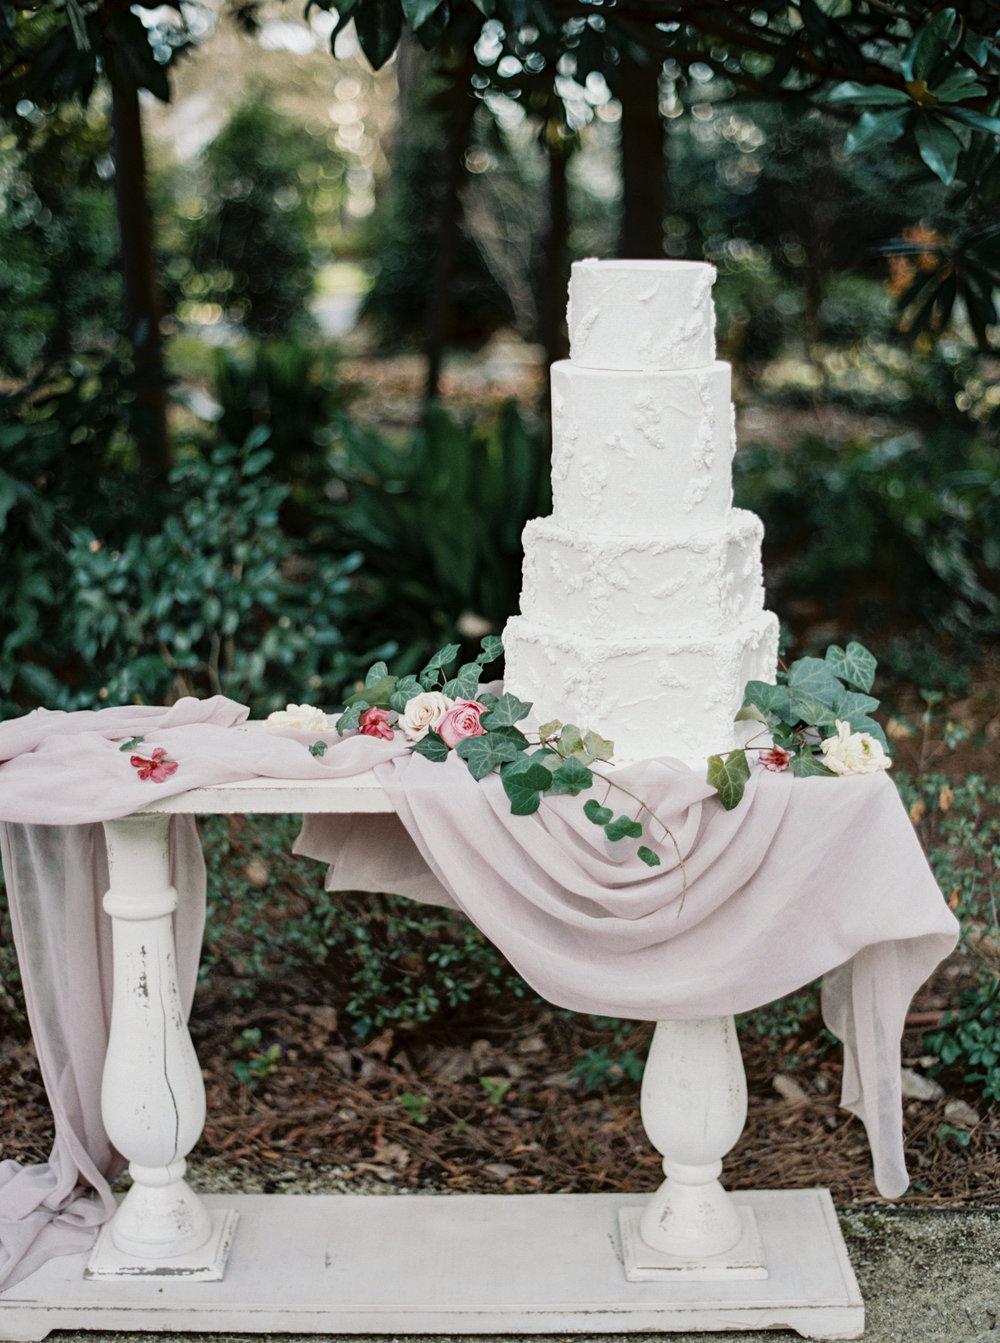 The-Graceful-Host-Wedding-Planning-Design-011.jpg